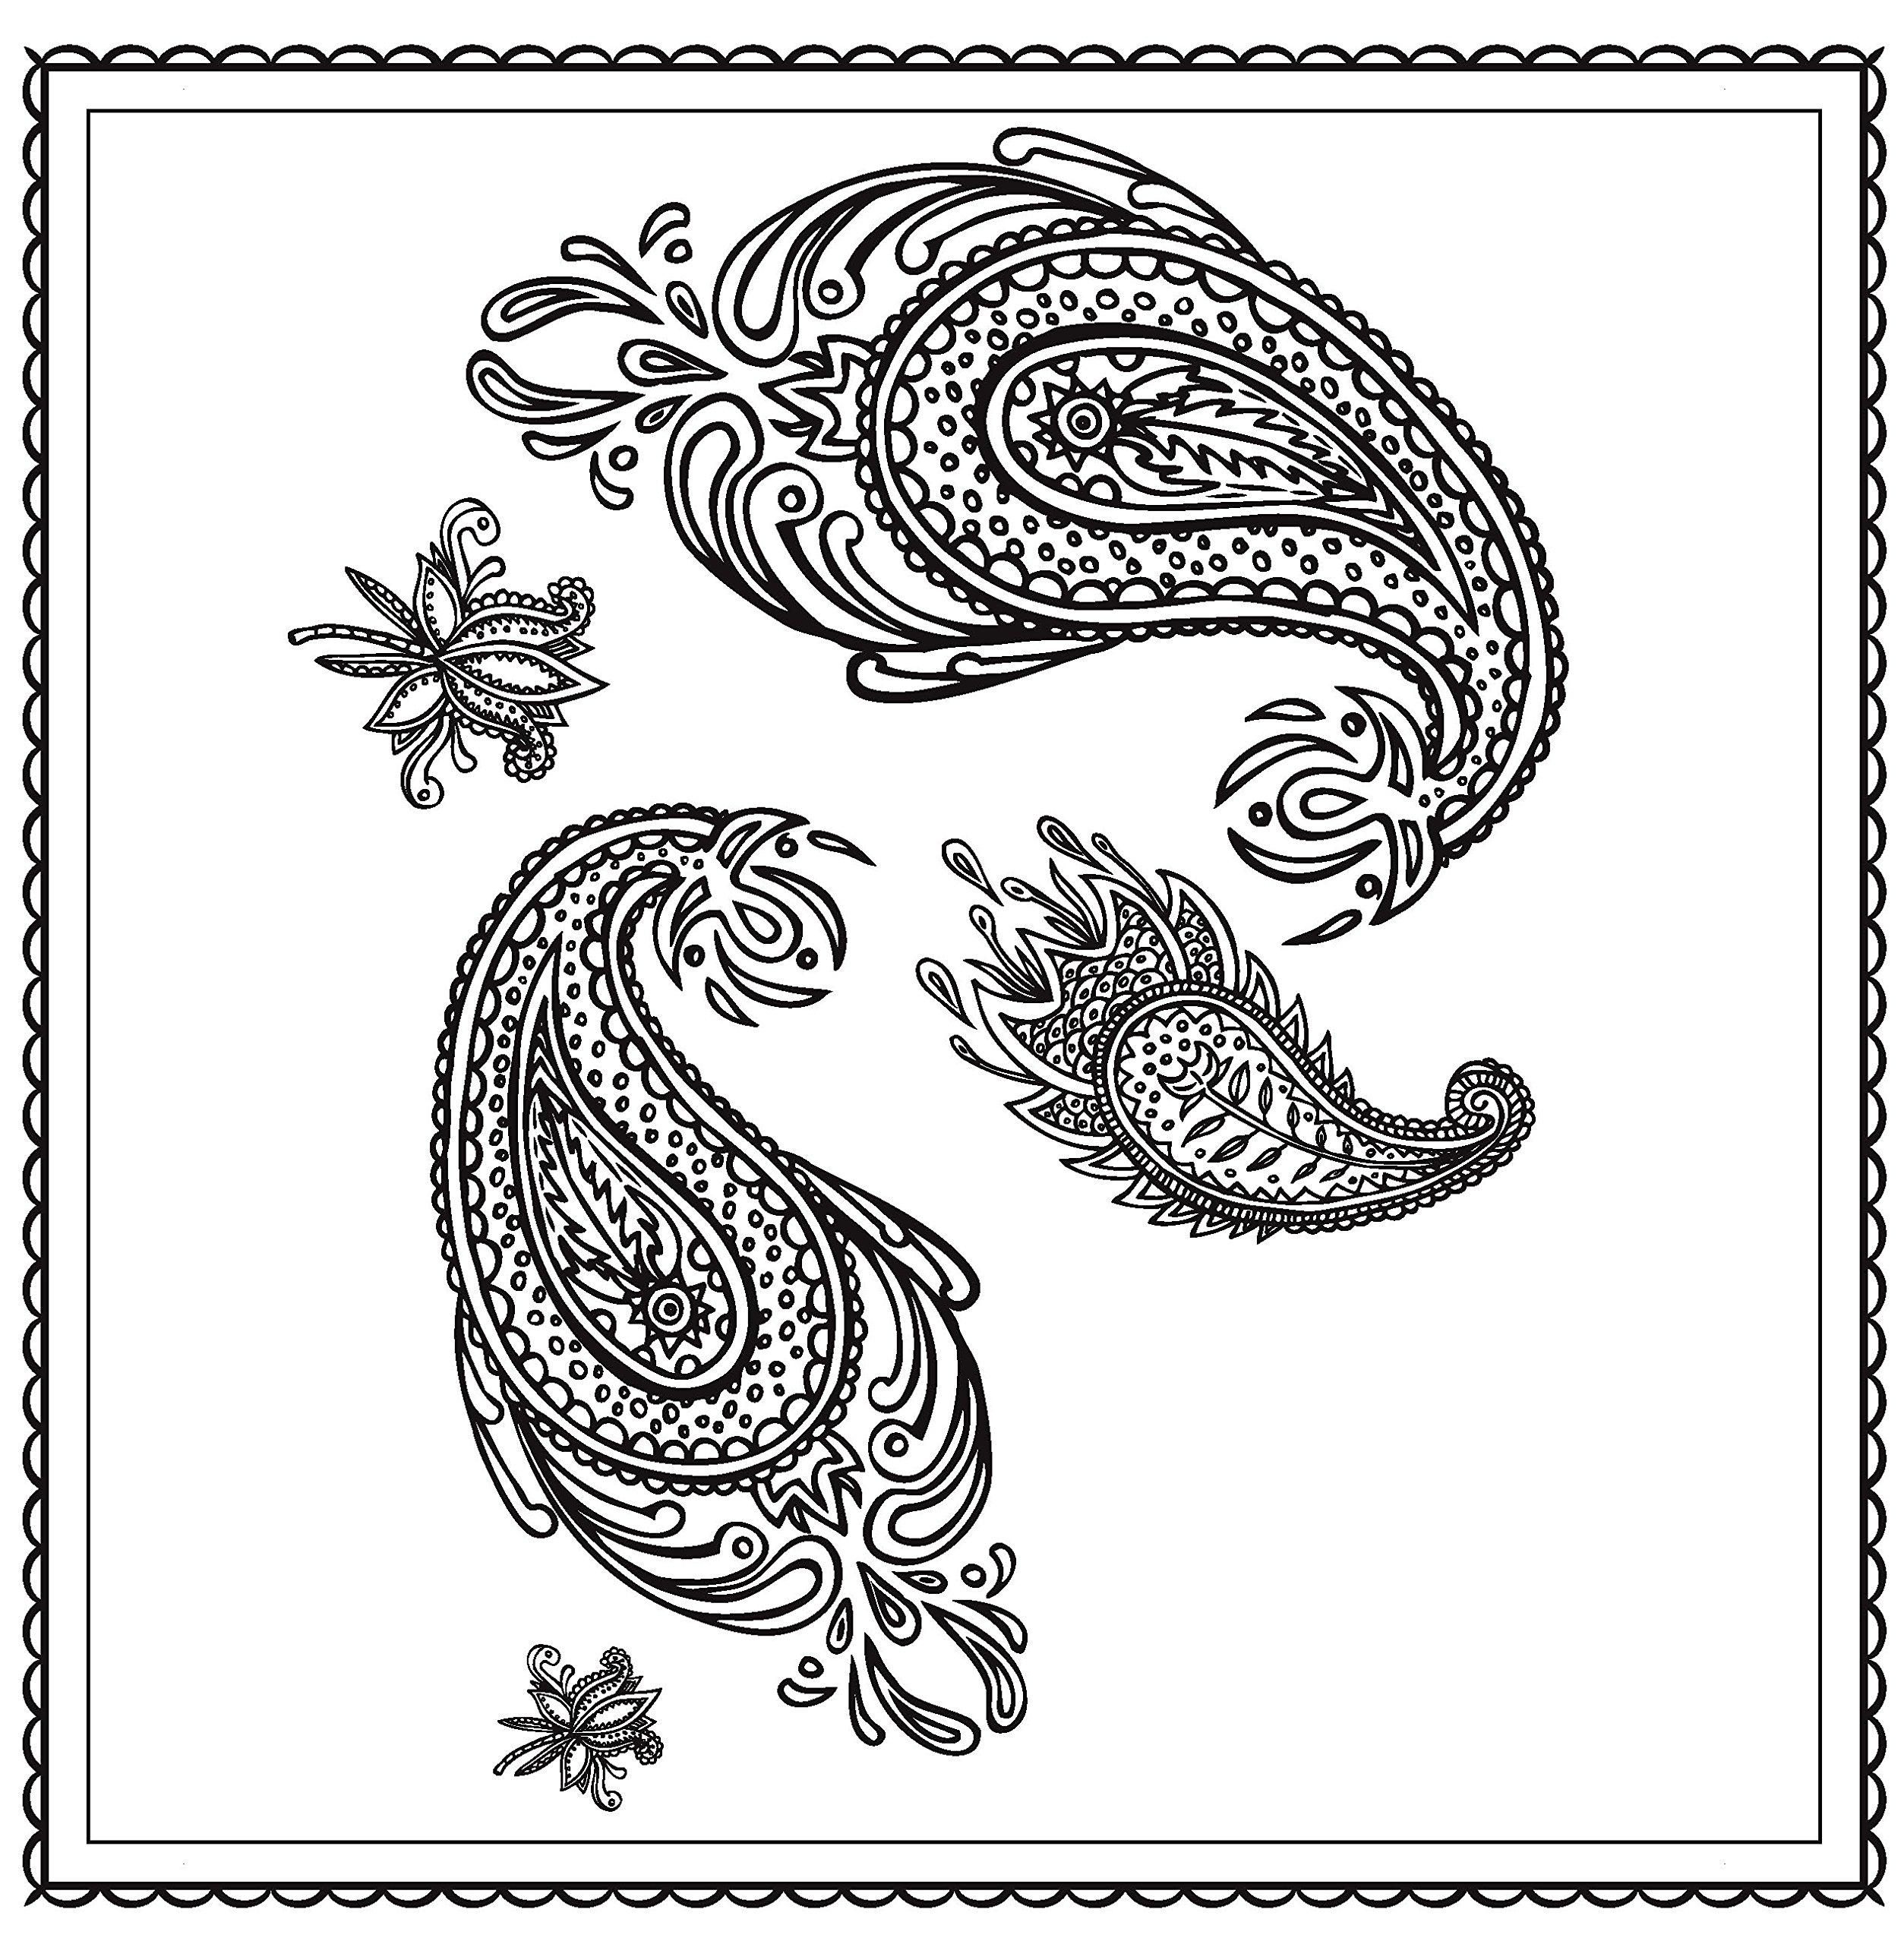 A fun magic coloring book amazon - Amazon Com Eastern Magic Beautiful Designs Of The Orient Coloring Book For Adults Color Magic 9781438007328 Arsedition Books